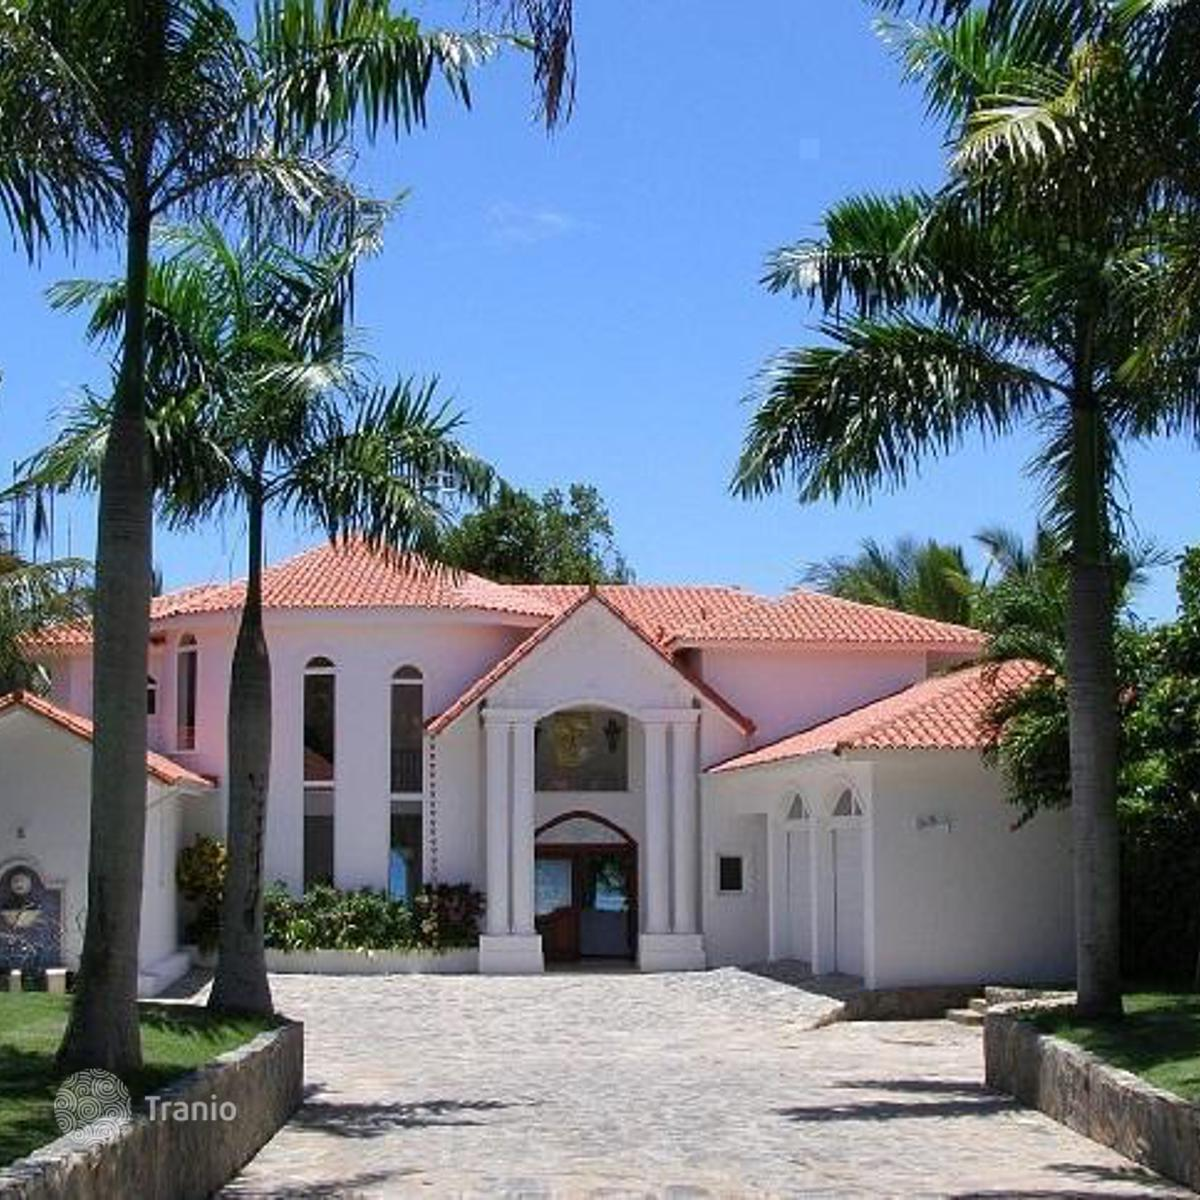 Доминикана дома фото